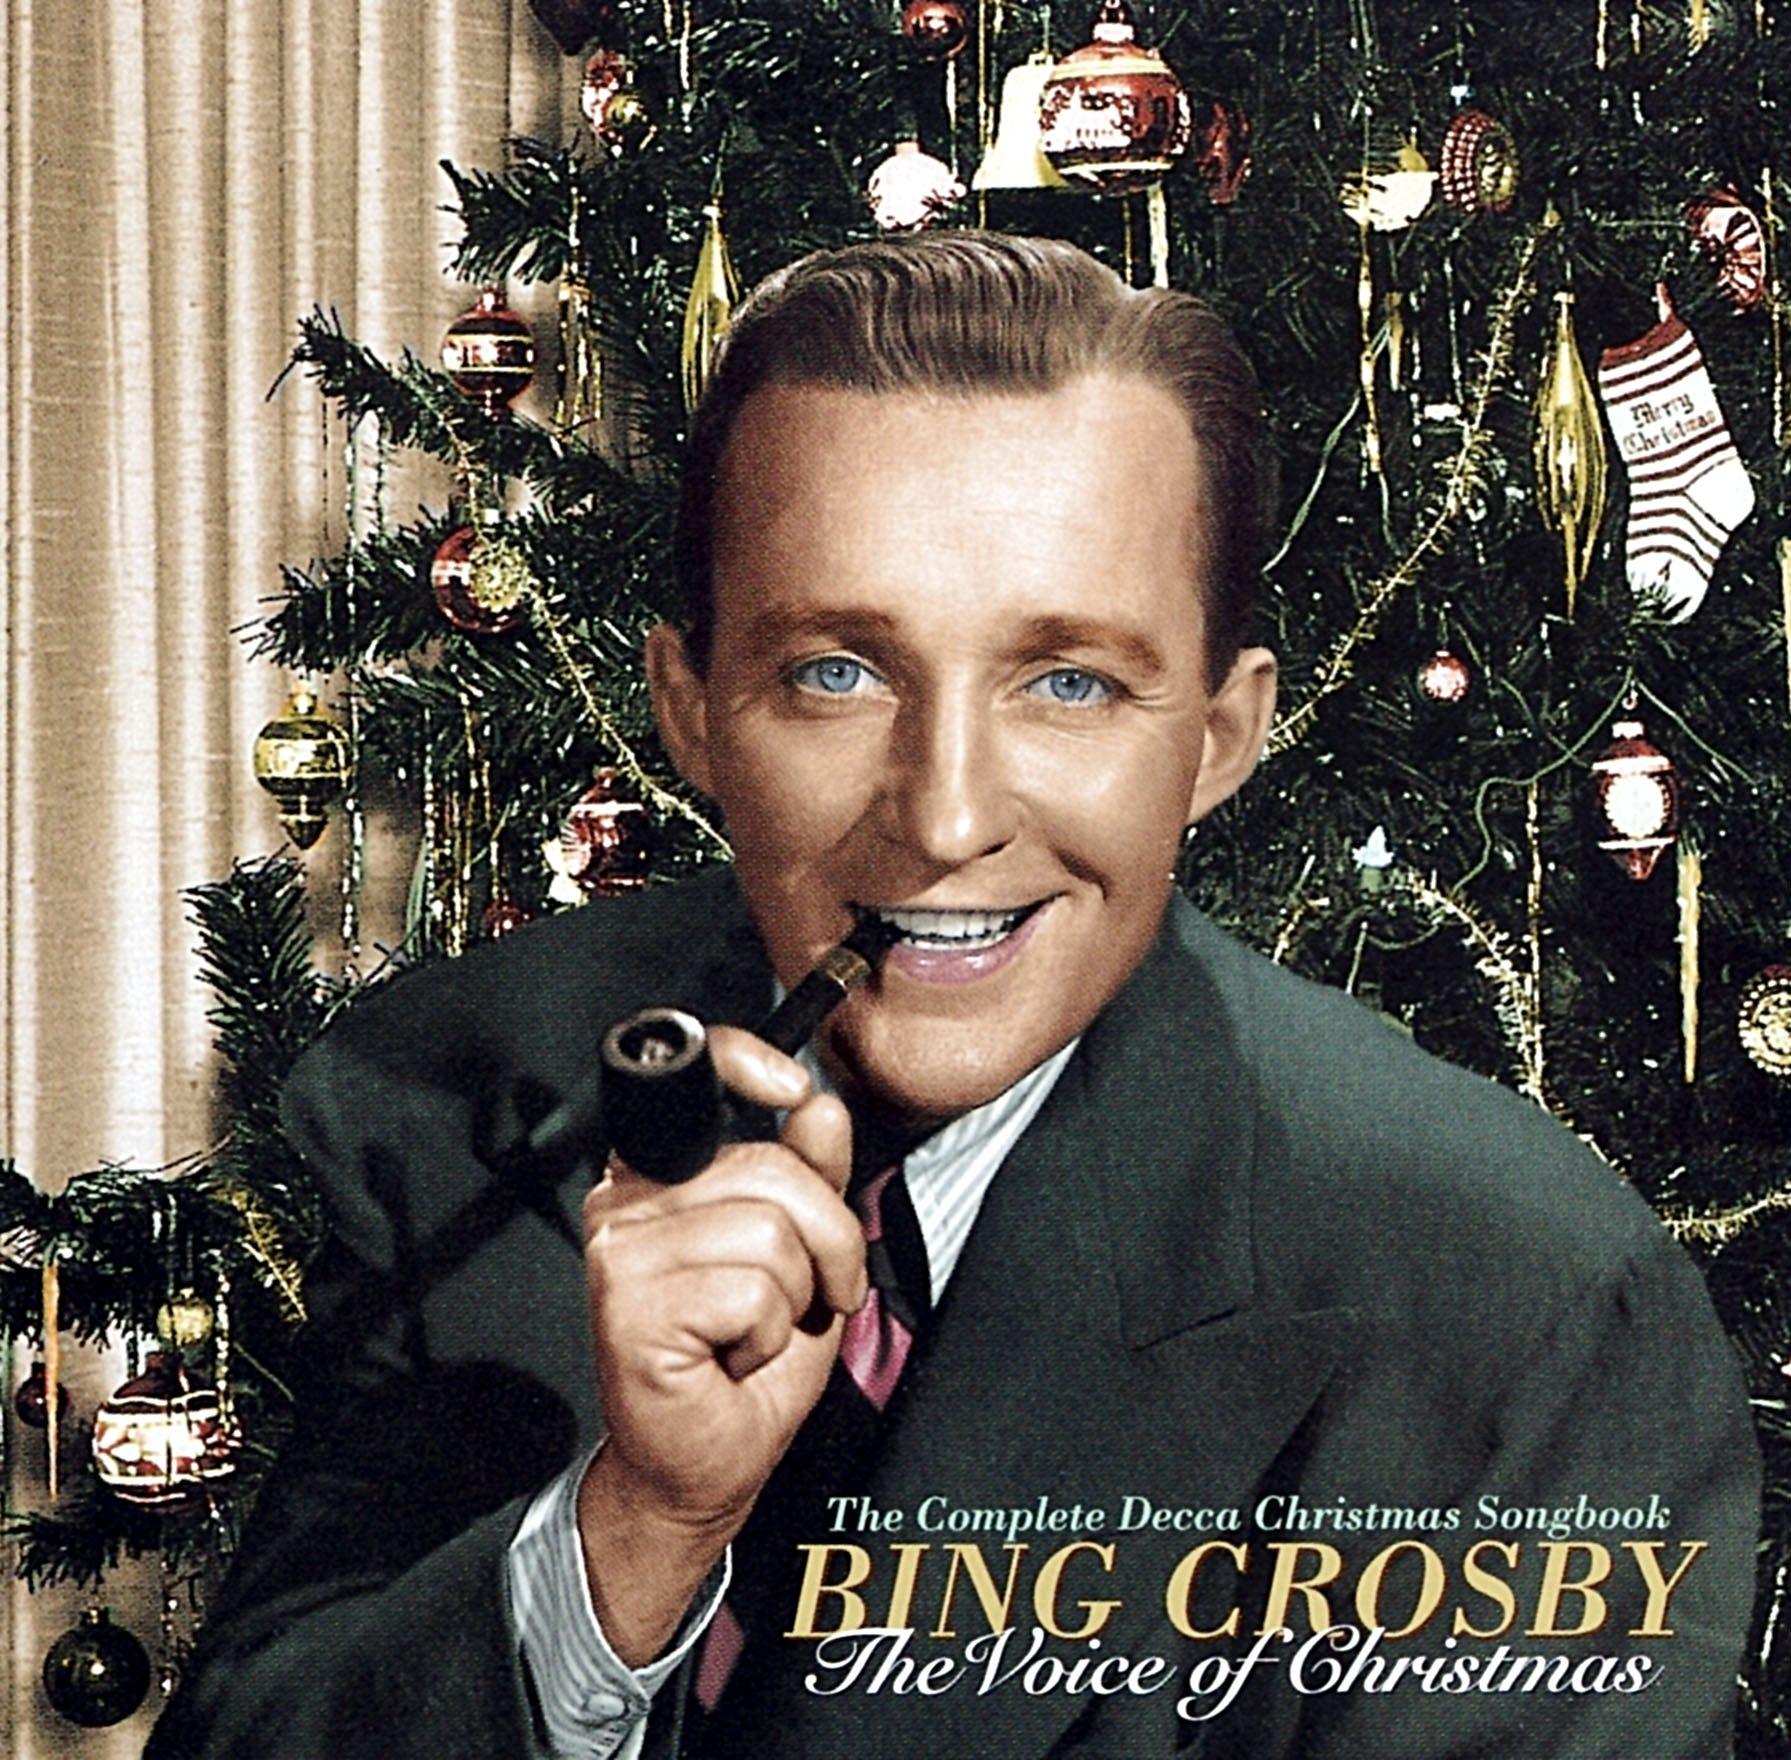 bing crosby white christmas lyricsbing crosby white christmas, bing crosby скачать, bing crosby jingle bells, bing crosby слушать, bing crosby white christmas mp3, bing crosby - swinging on a star, bing crosby mele kalikimaka скачать, bing crosby play a simple melody, bing crosby & the andrews sisters, bing crosby discography, bing crosby mp3, bing crosby ac-cent-tchu-ate the positive, bing crosby david bowie, bing crosby christmas album, bing crosby when i lost my baby, bing crosby seasons, bing crosby silent night, bing crosby white christmas lyrics, bing crosby - mele kalikimaka, bing crosby way back home